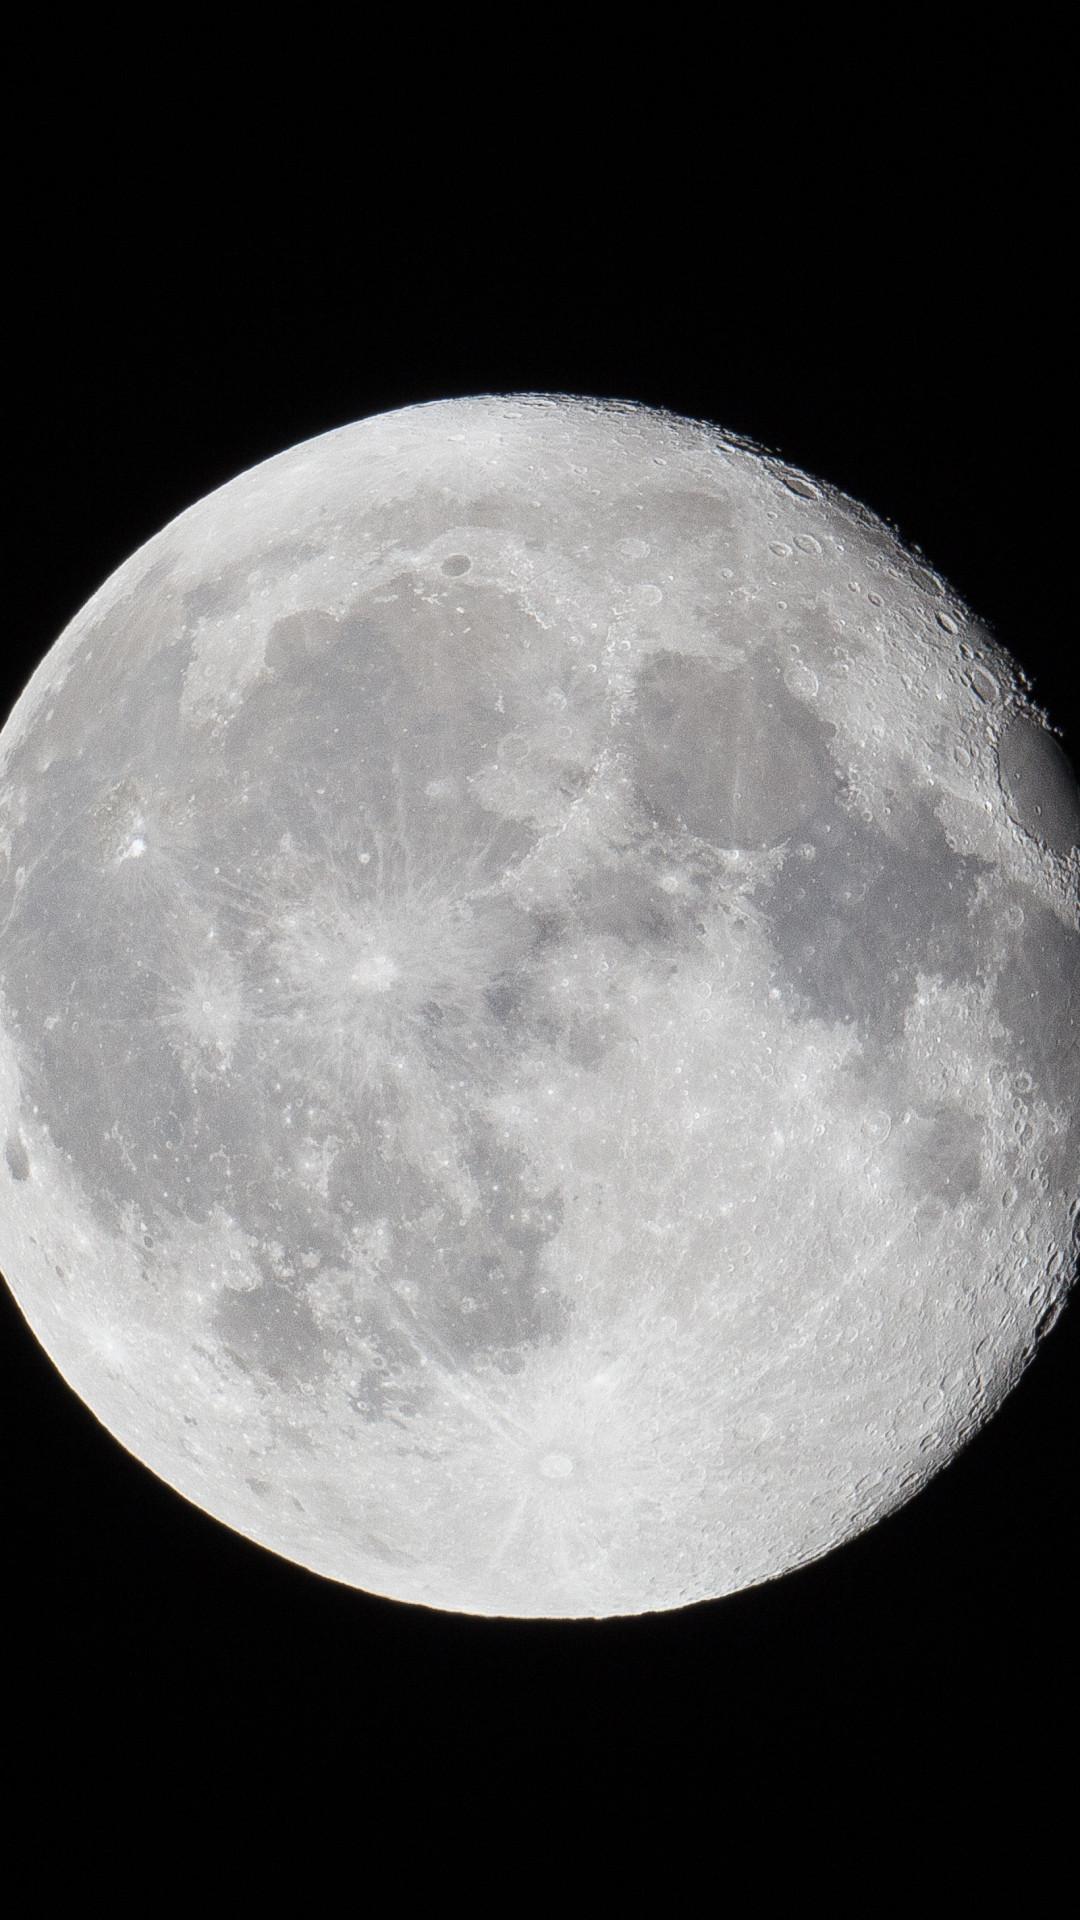 Full Moon Iphone Wallpaper